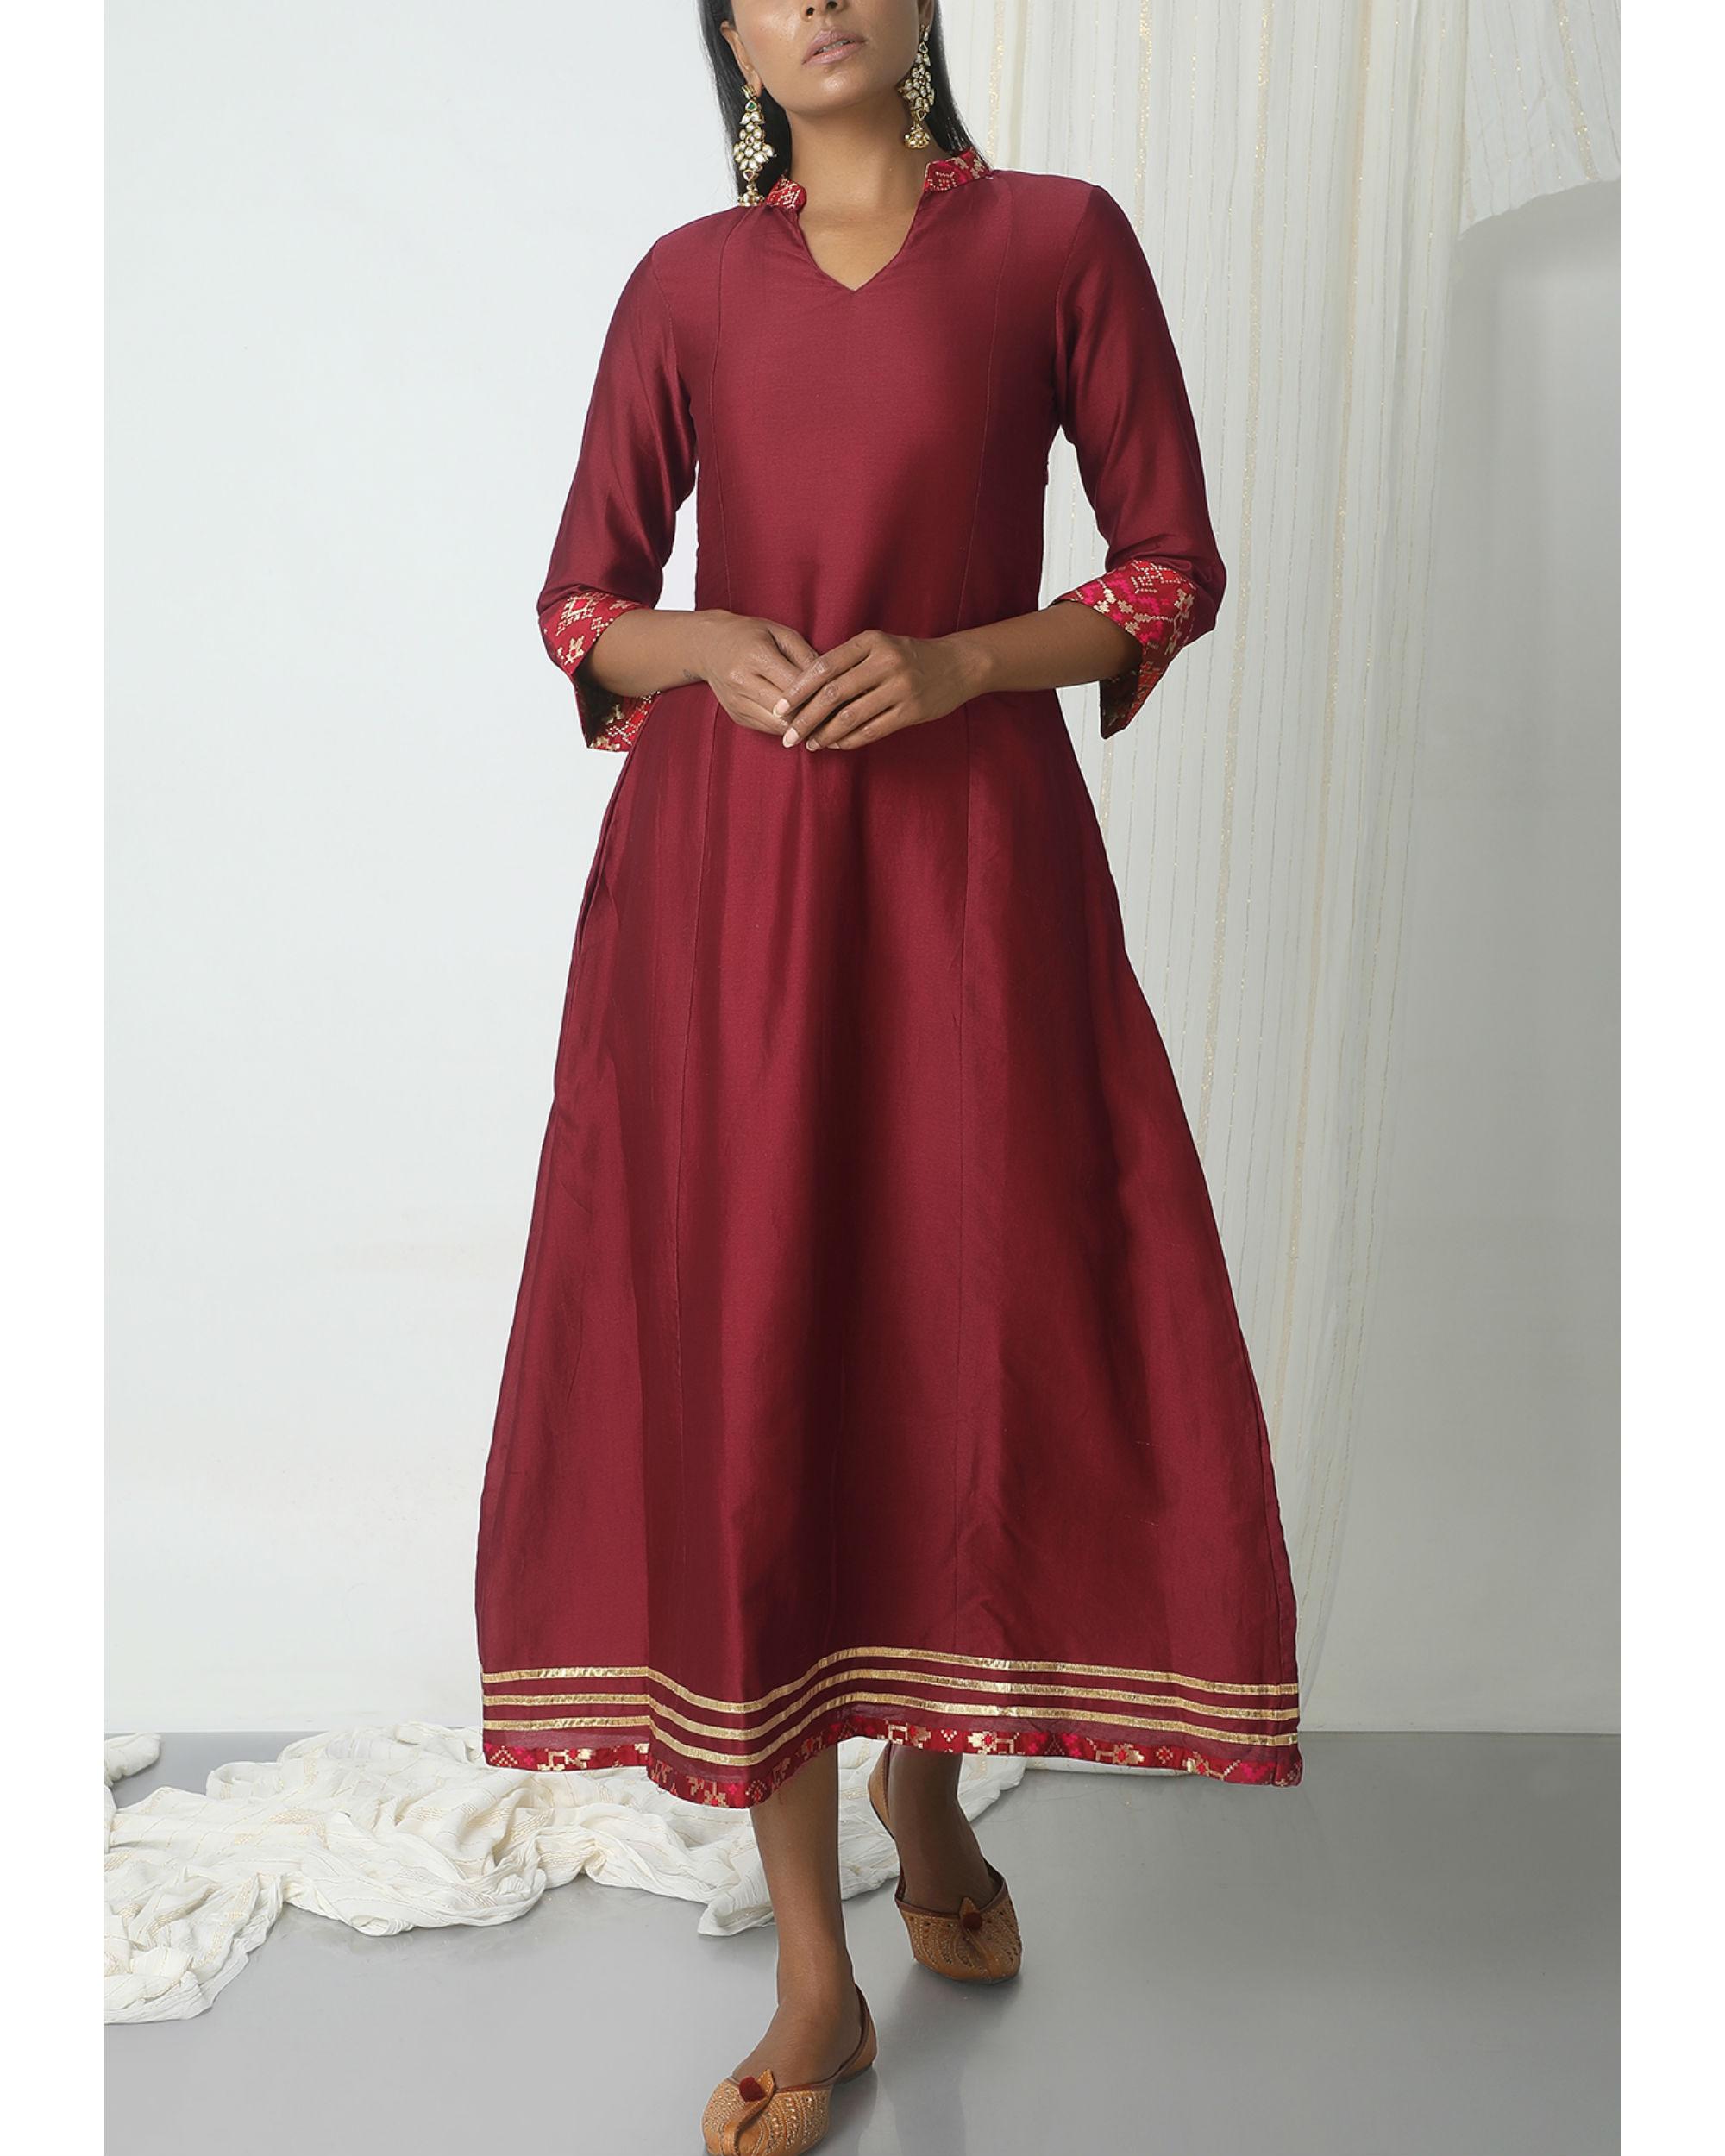 Maroon brocade gota kurta dress